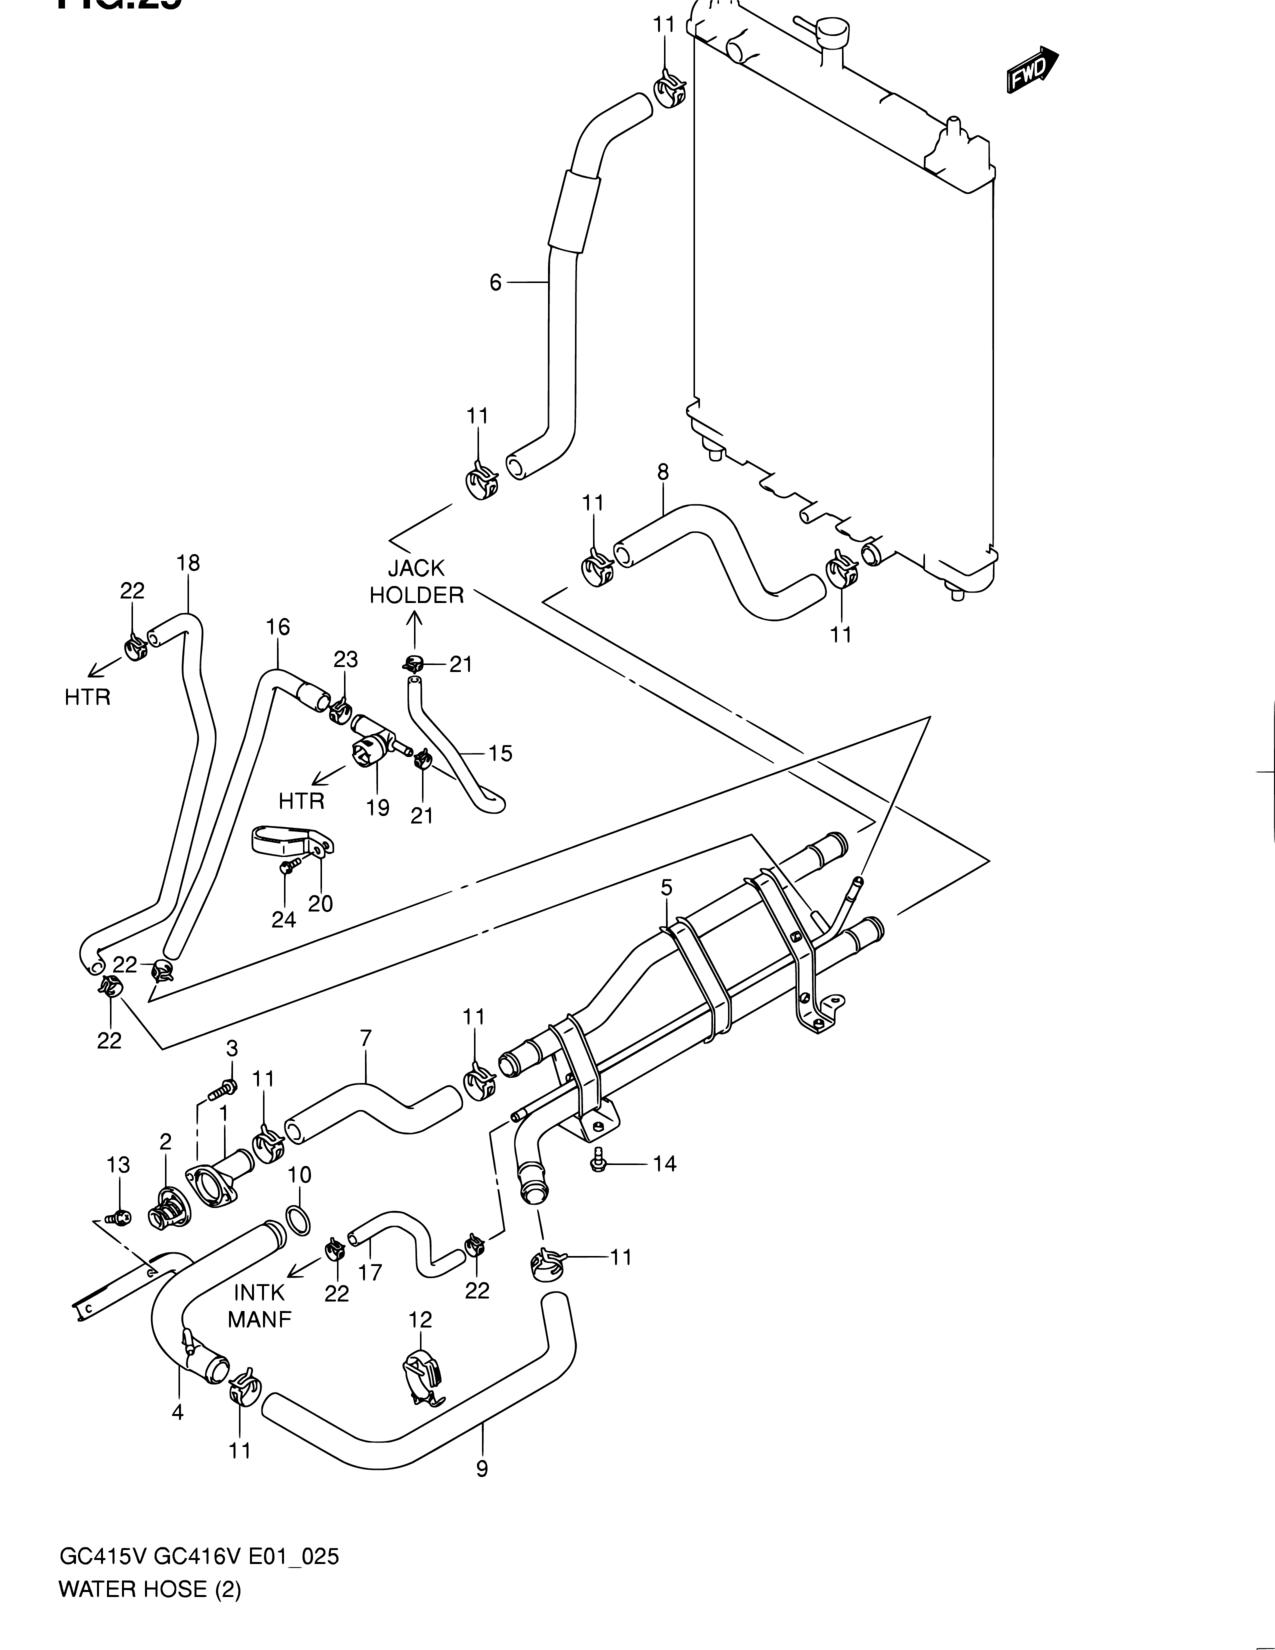 hight resolution of suzuki apv fuse box wiring diagramsuzuki apv fuse box basic electronics wiring diagram suzuki apv fuse